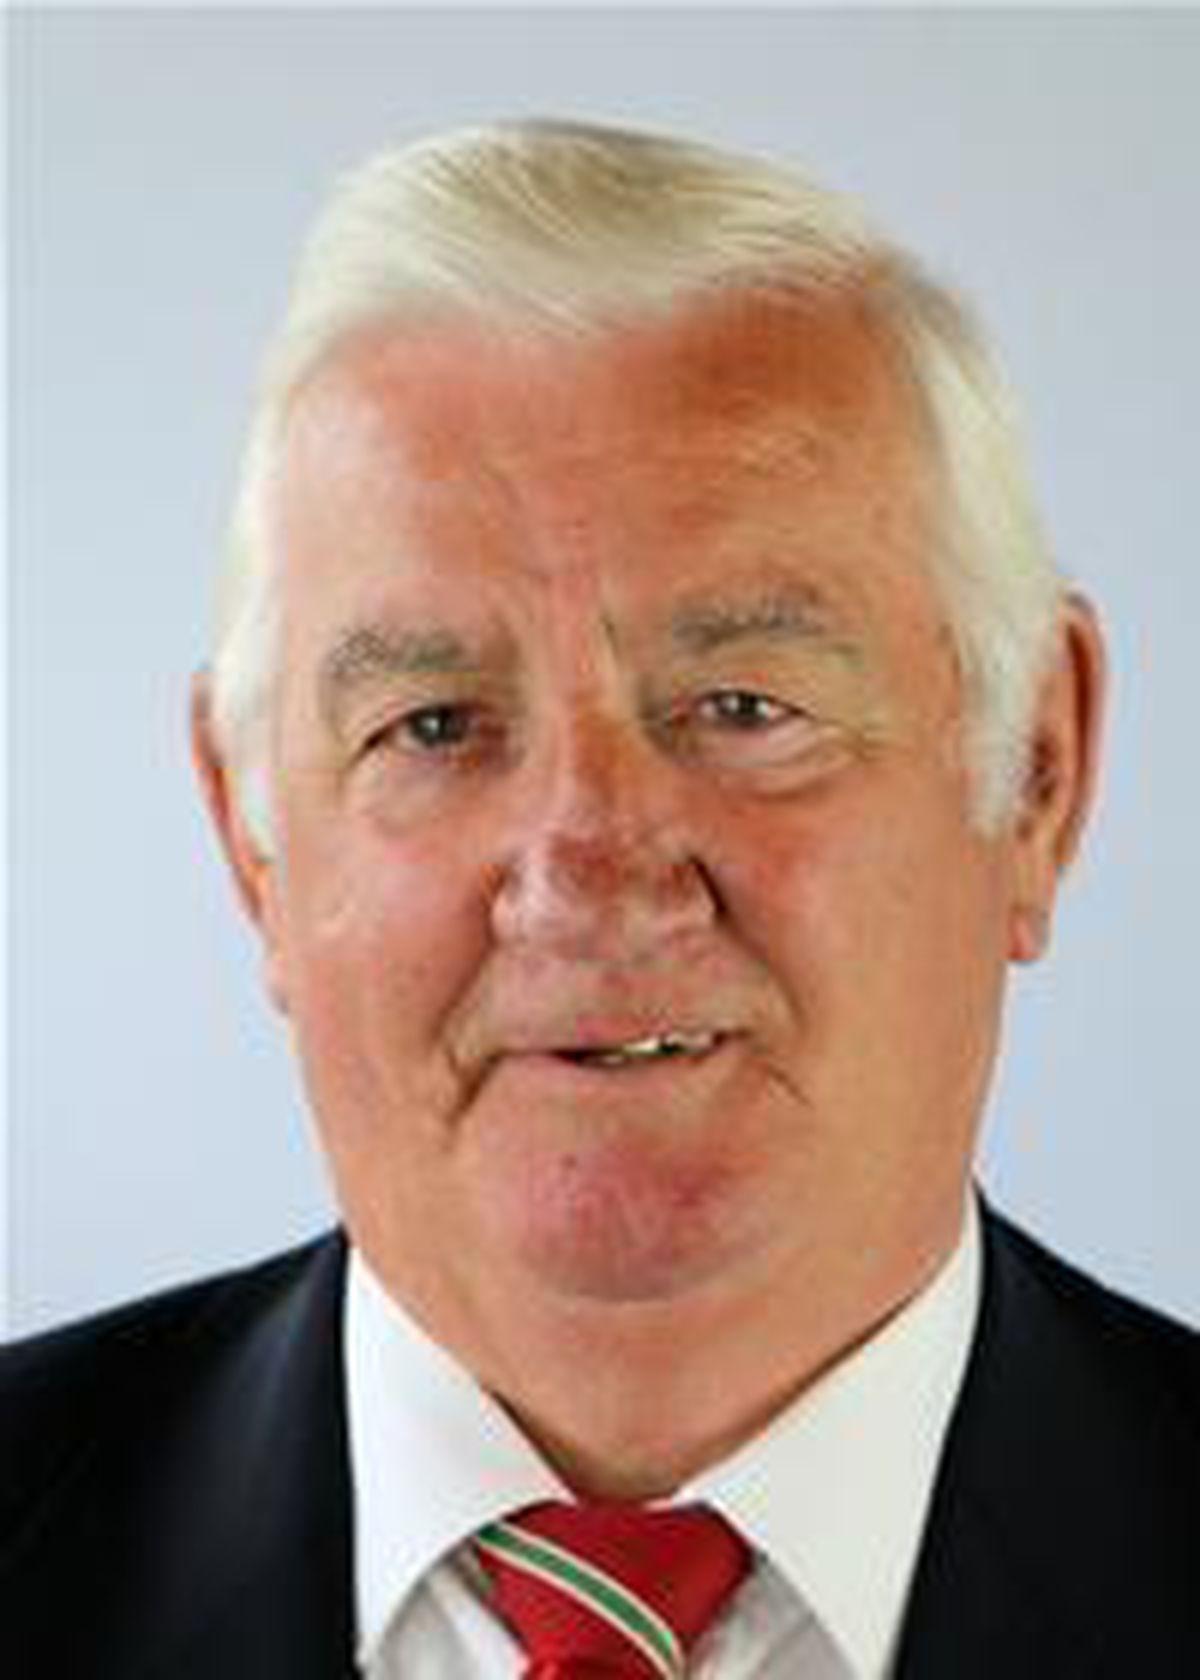 Councillor Phil Pritchard